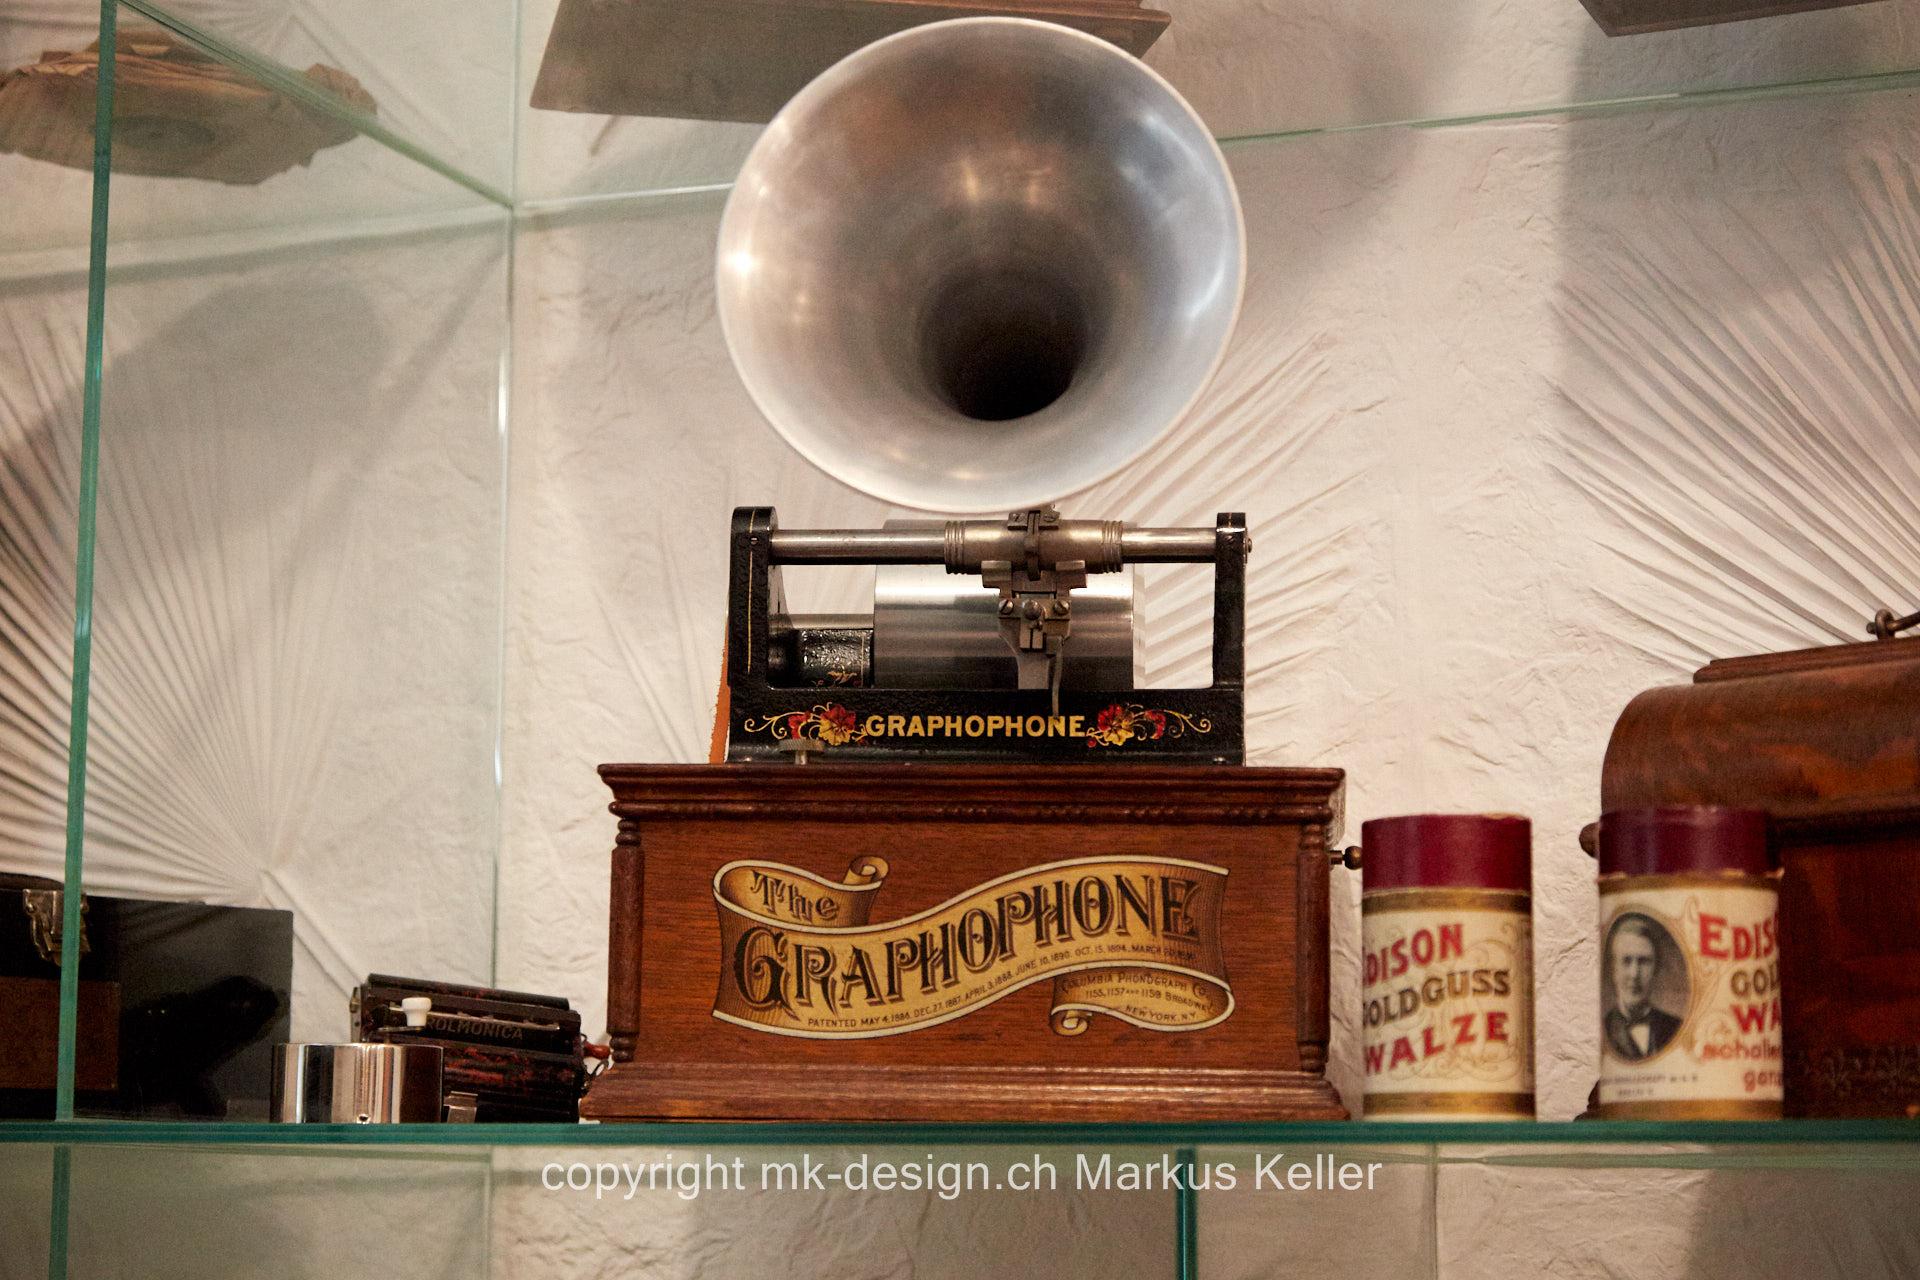 Event   rczo-anlass   Instrument   Spieluhr/Klangmaschine